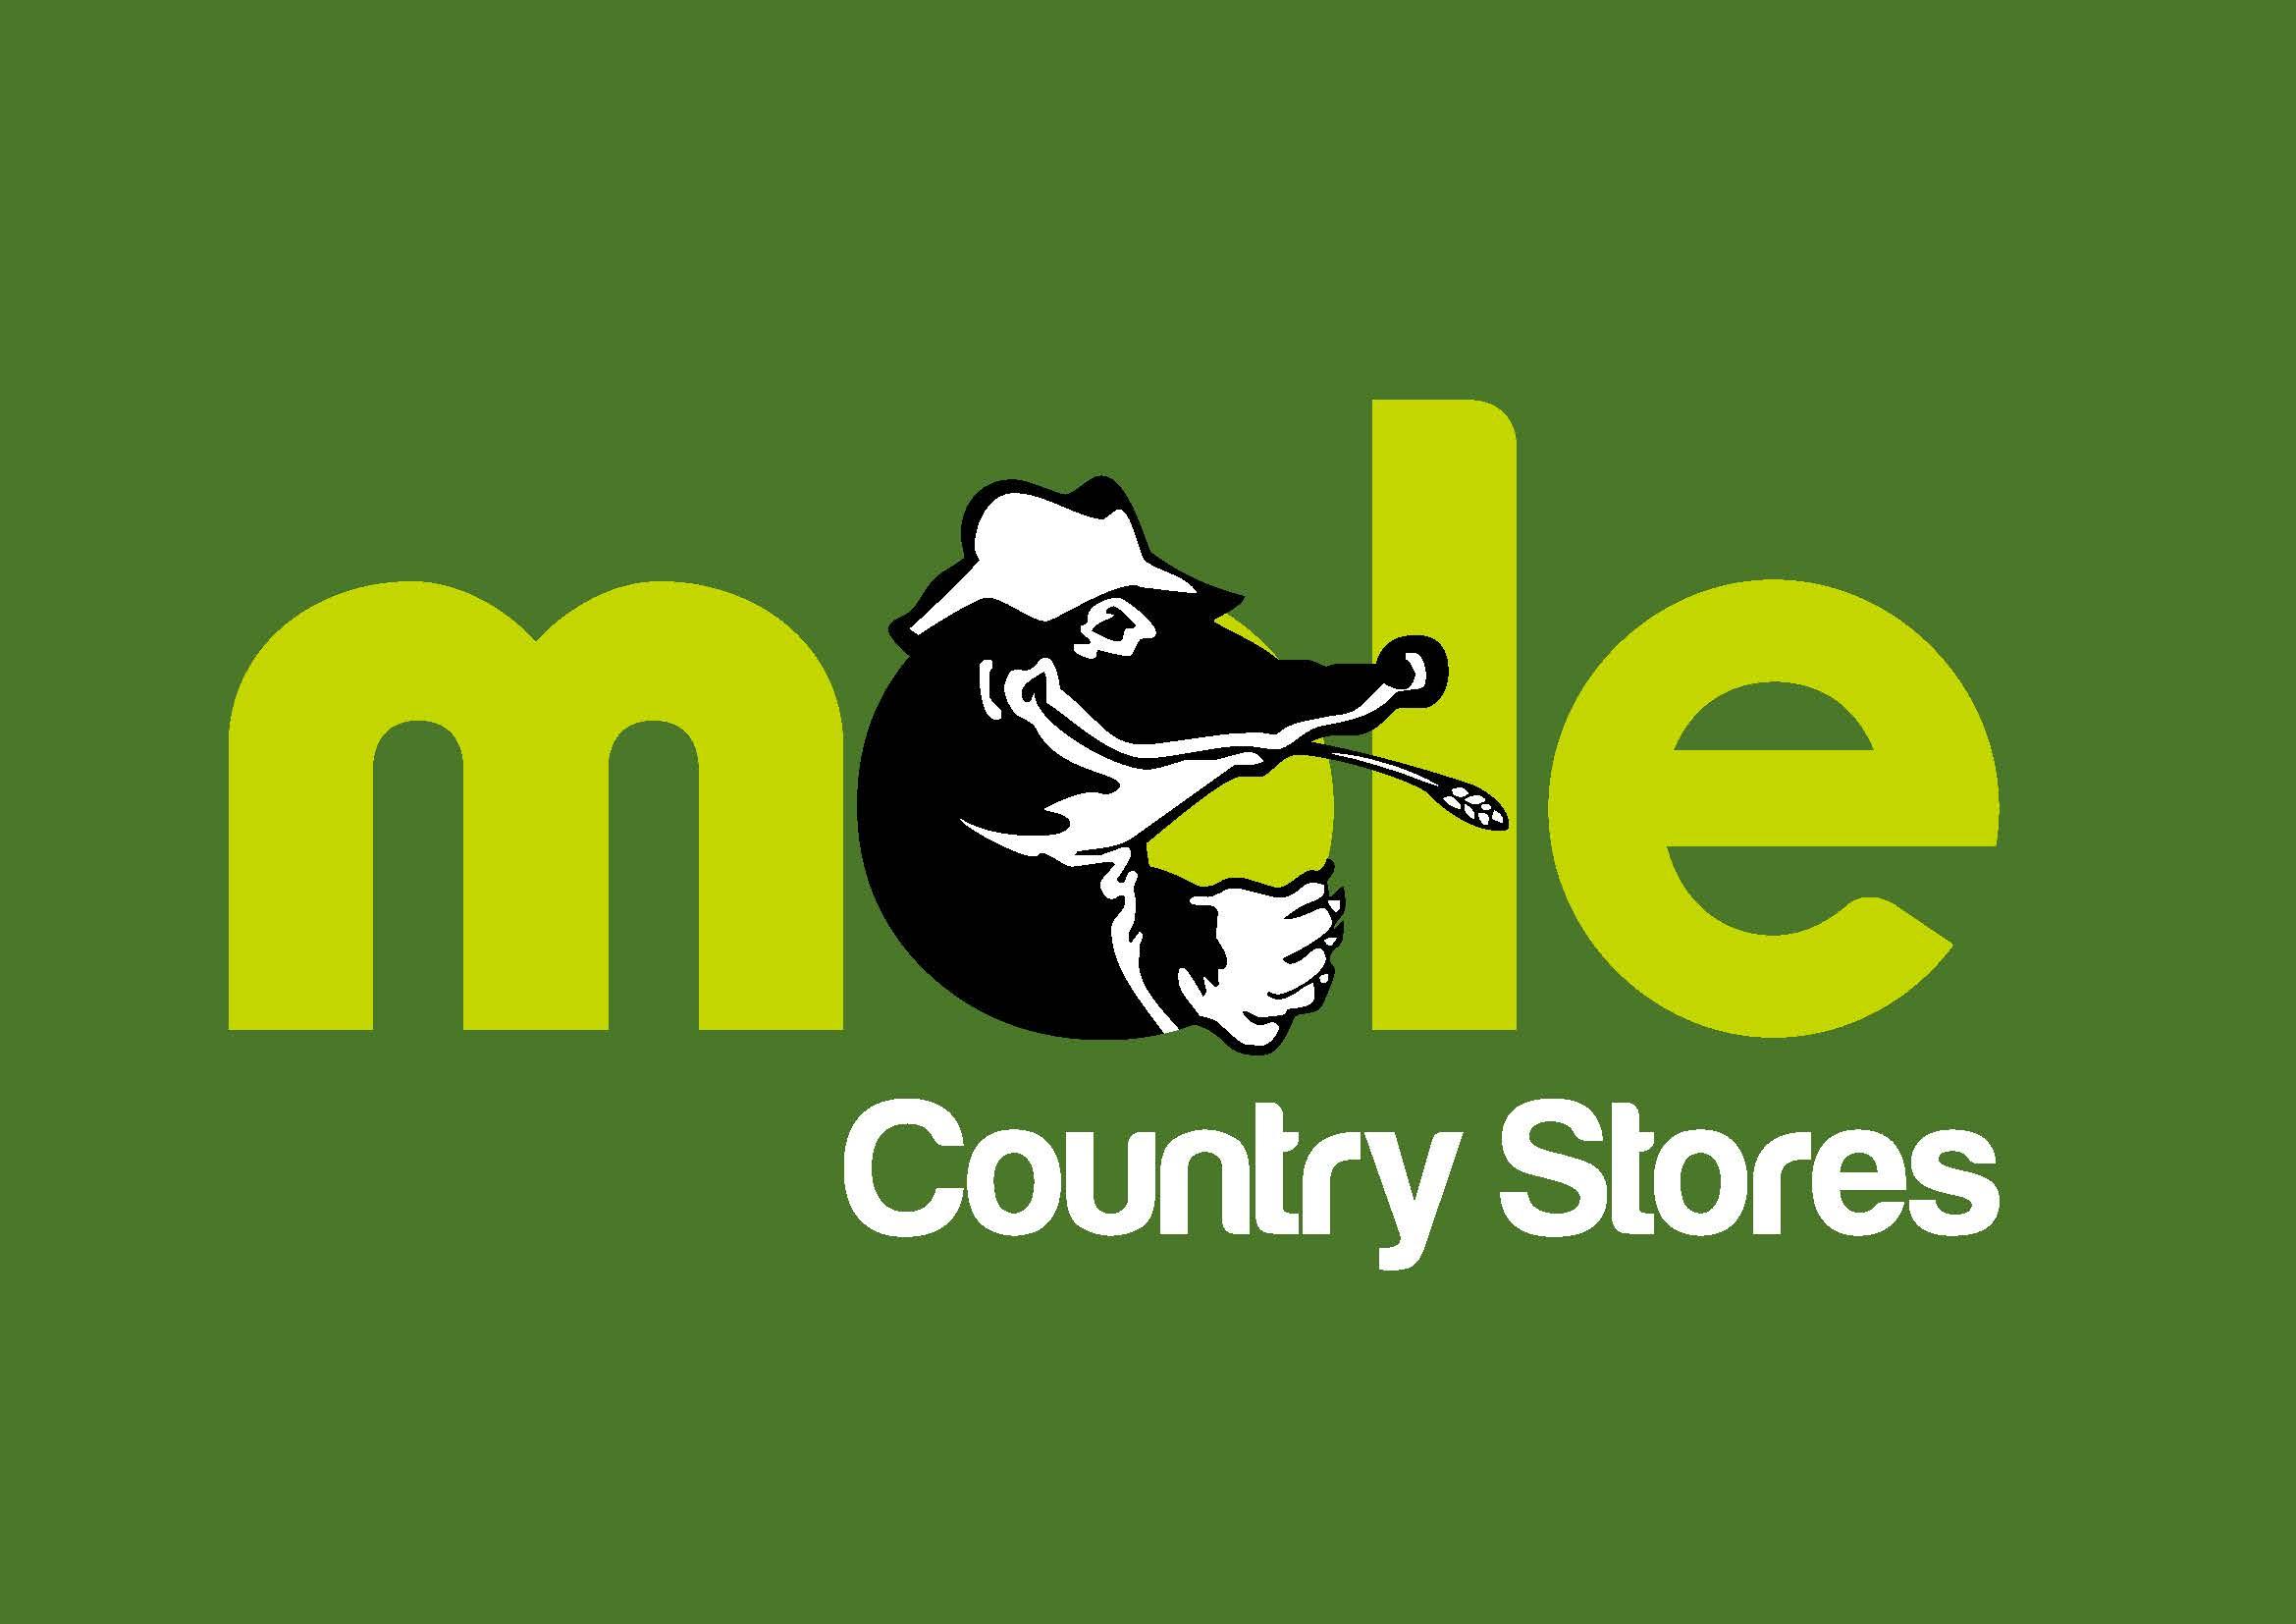 Mole Country Stores Bury St Edmunds